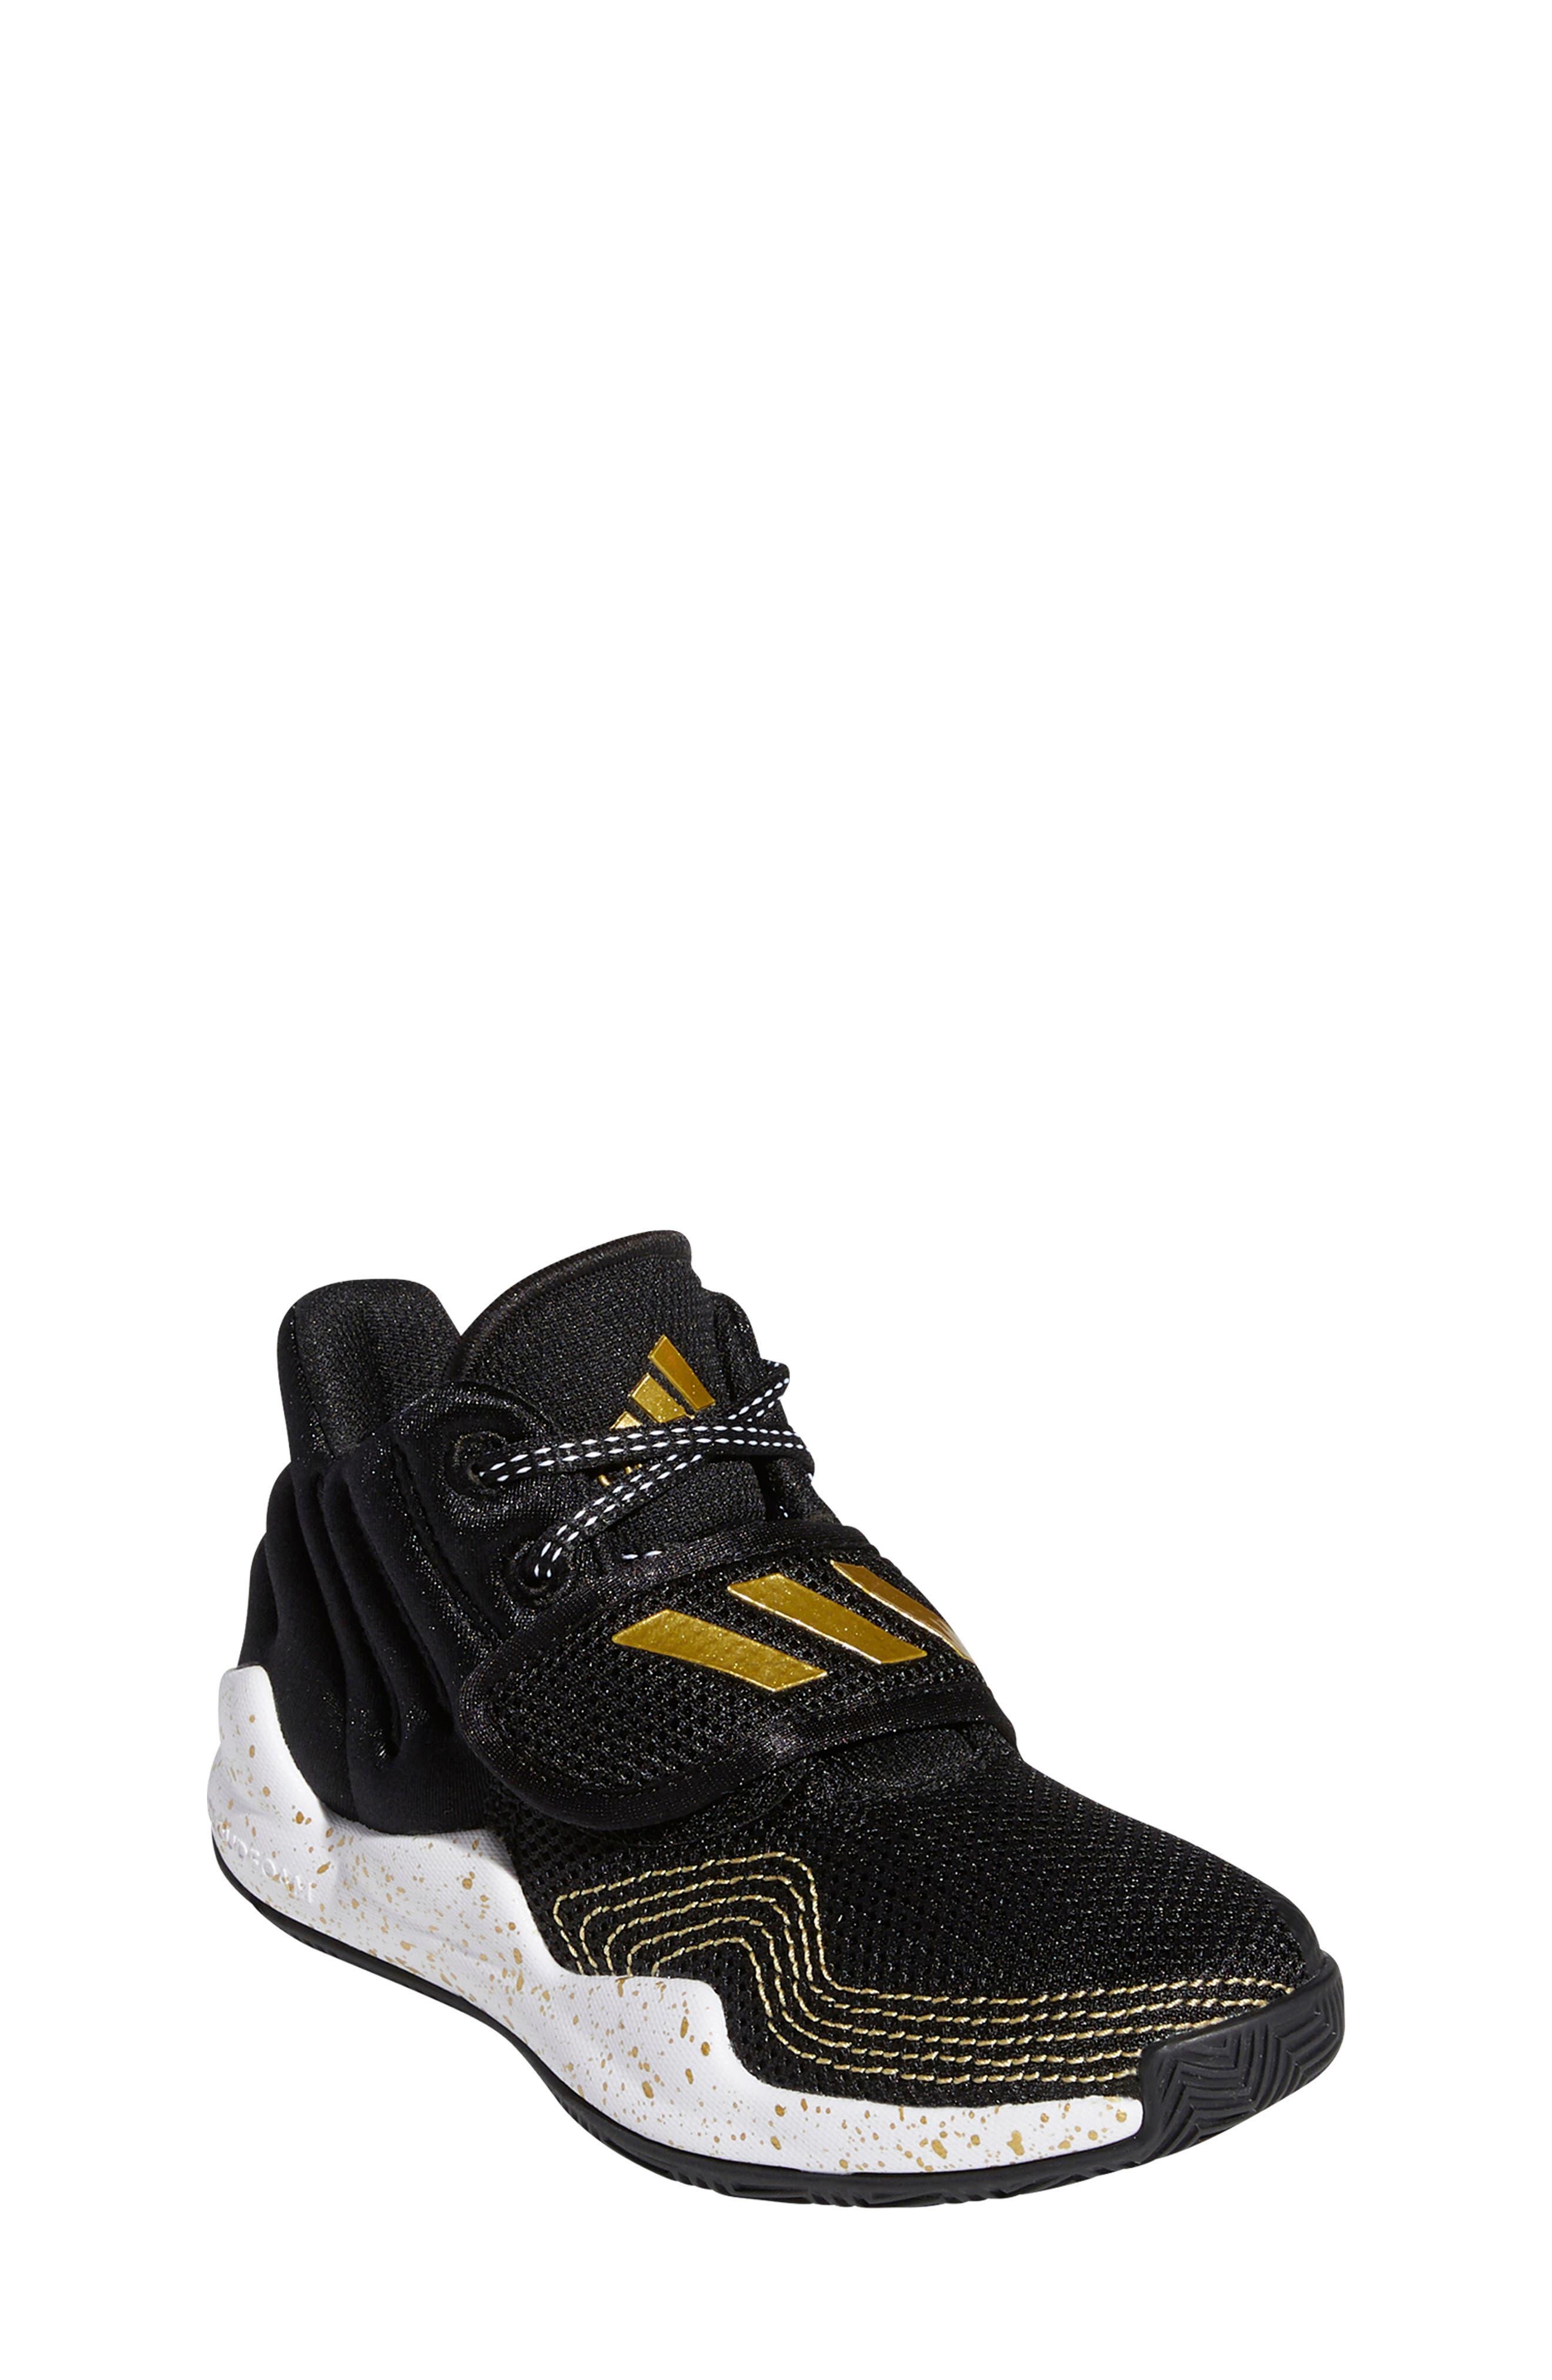 Adidas Deep Threat Basketball Shoe (Toddler & Little Kid)   Nordstrom